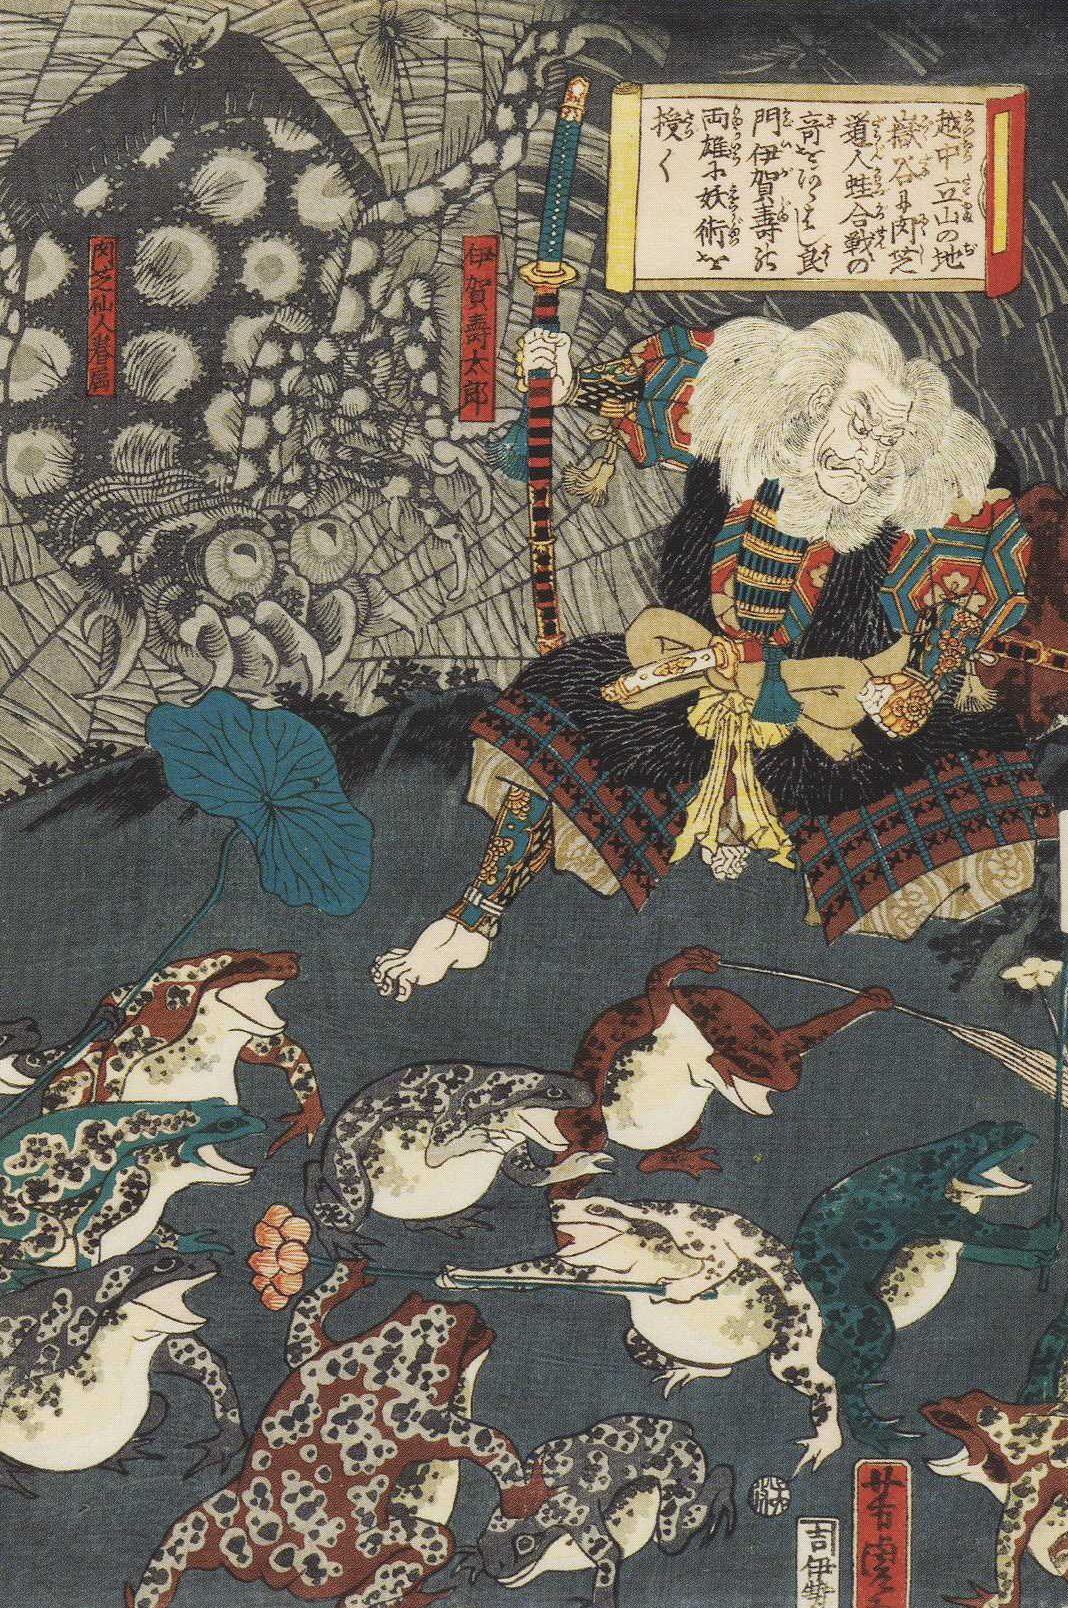 Utagawa Yoshitora 1850 80 Nikushi The Frog Spirit Conjures Up A Magical Battle Of Frogs At Tateyama In Etchu Province From Ashmolean Museum